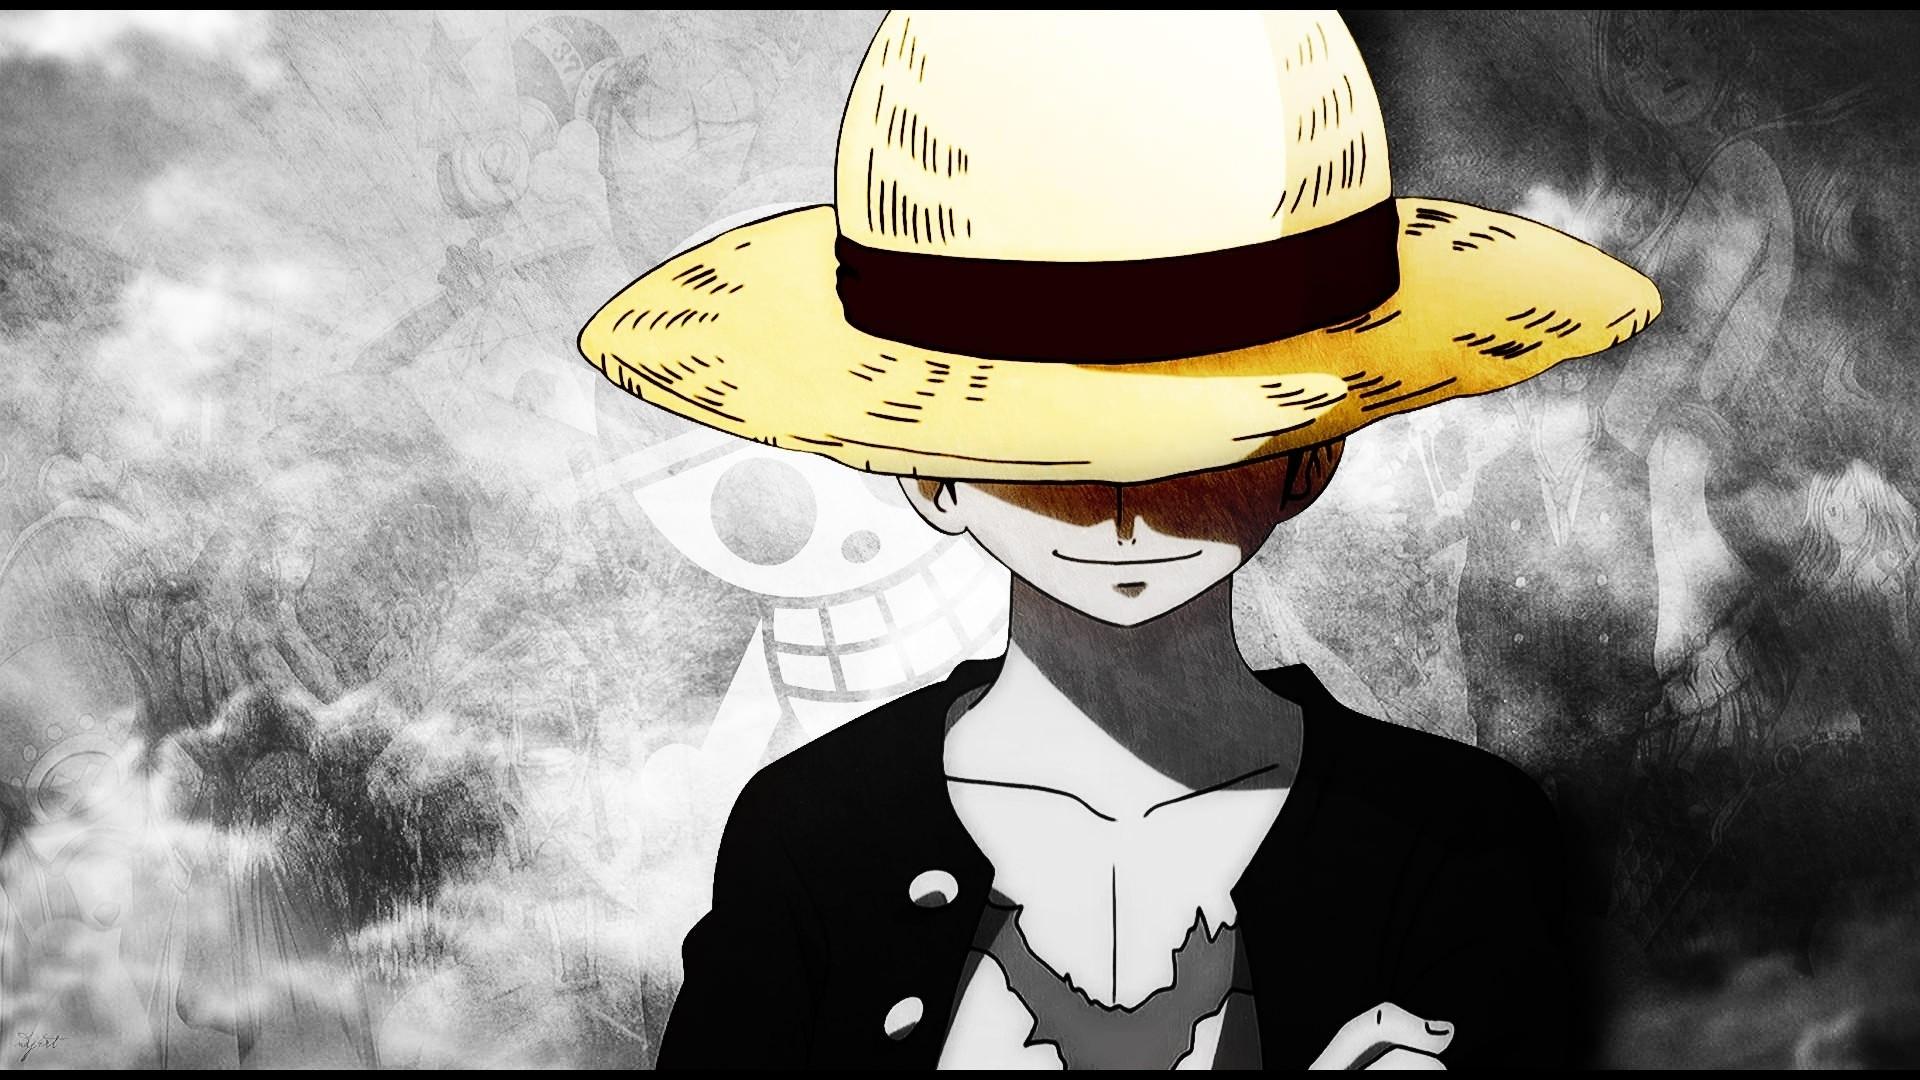 Luffy One Piece Wallpaper Hd One Piece Full Hd 85172